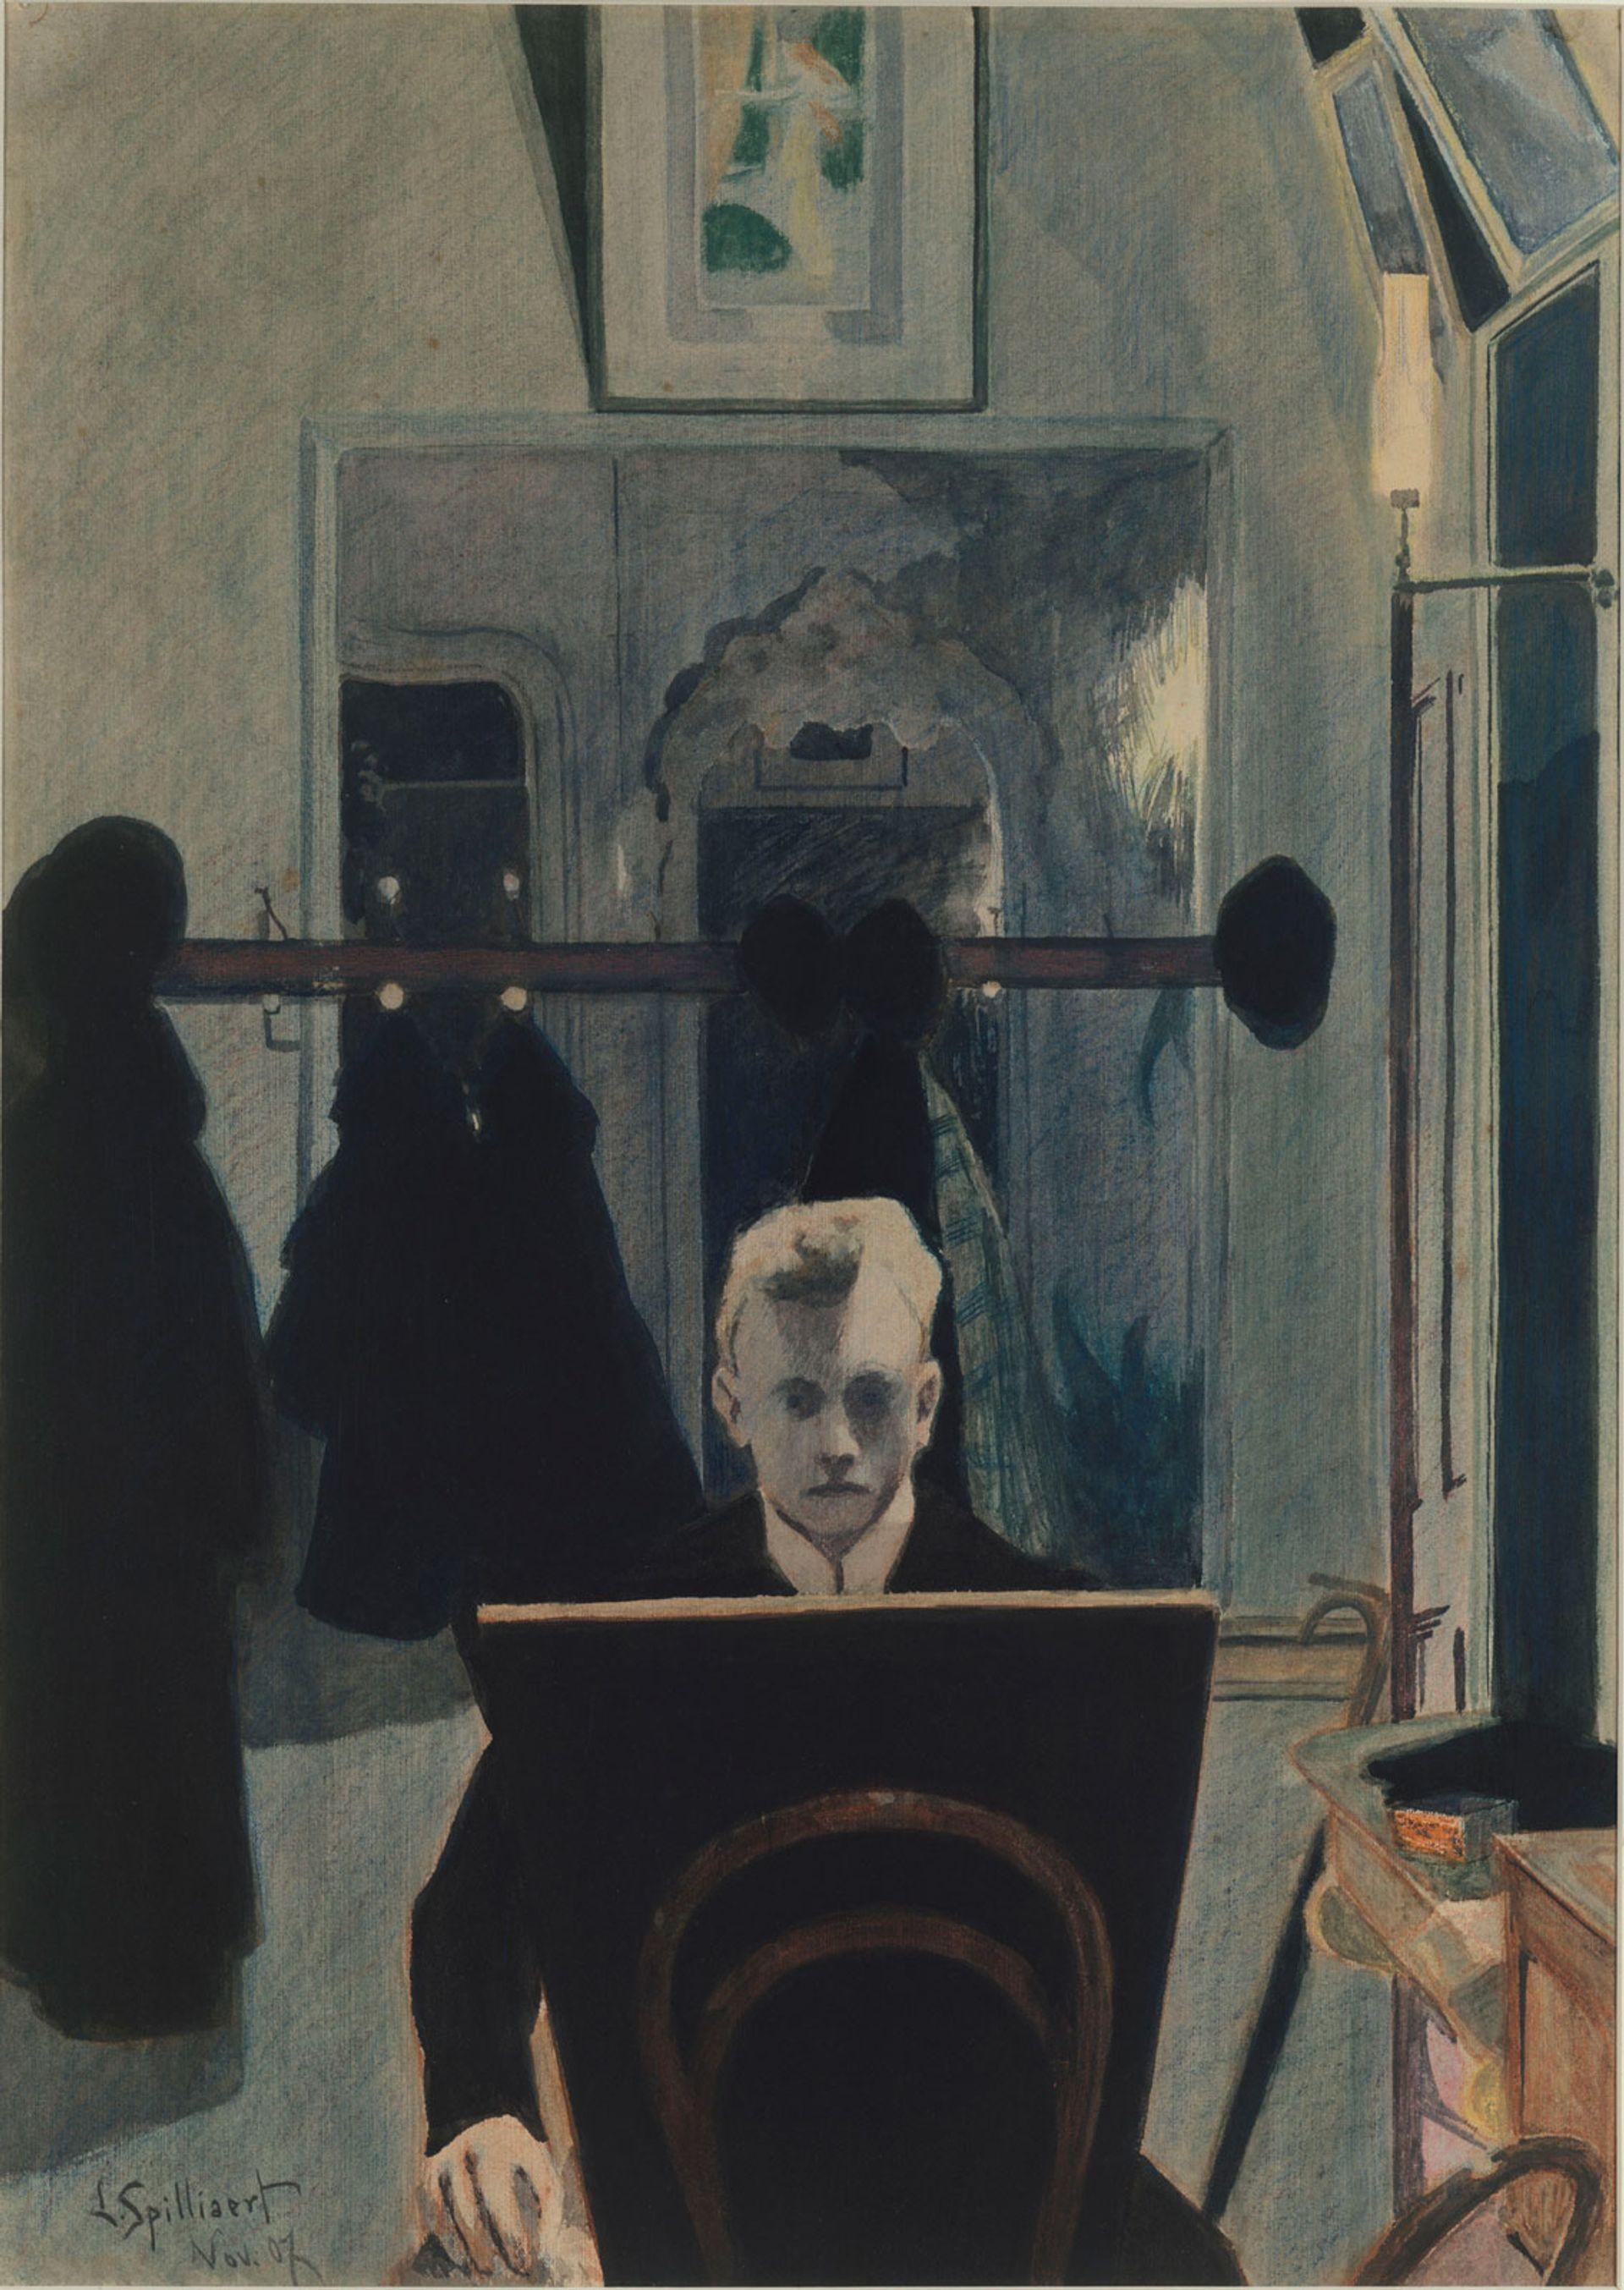 Léon Spilliaert's Self-portrait (1907) © 2019 The Metropolitan Museum of Art/Art Resource/Scala, Florence